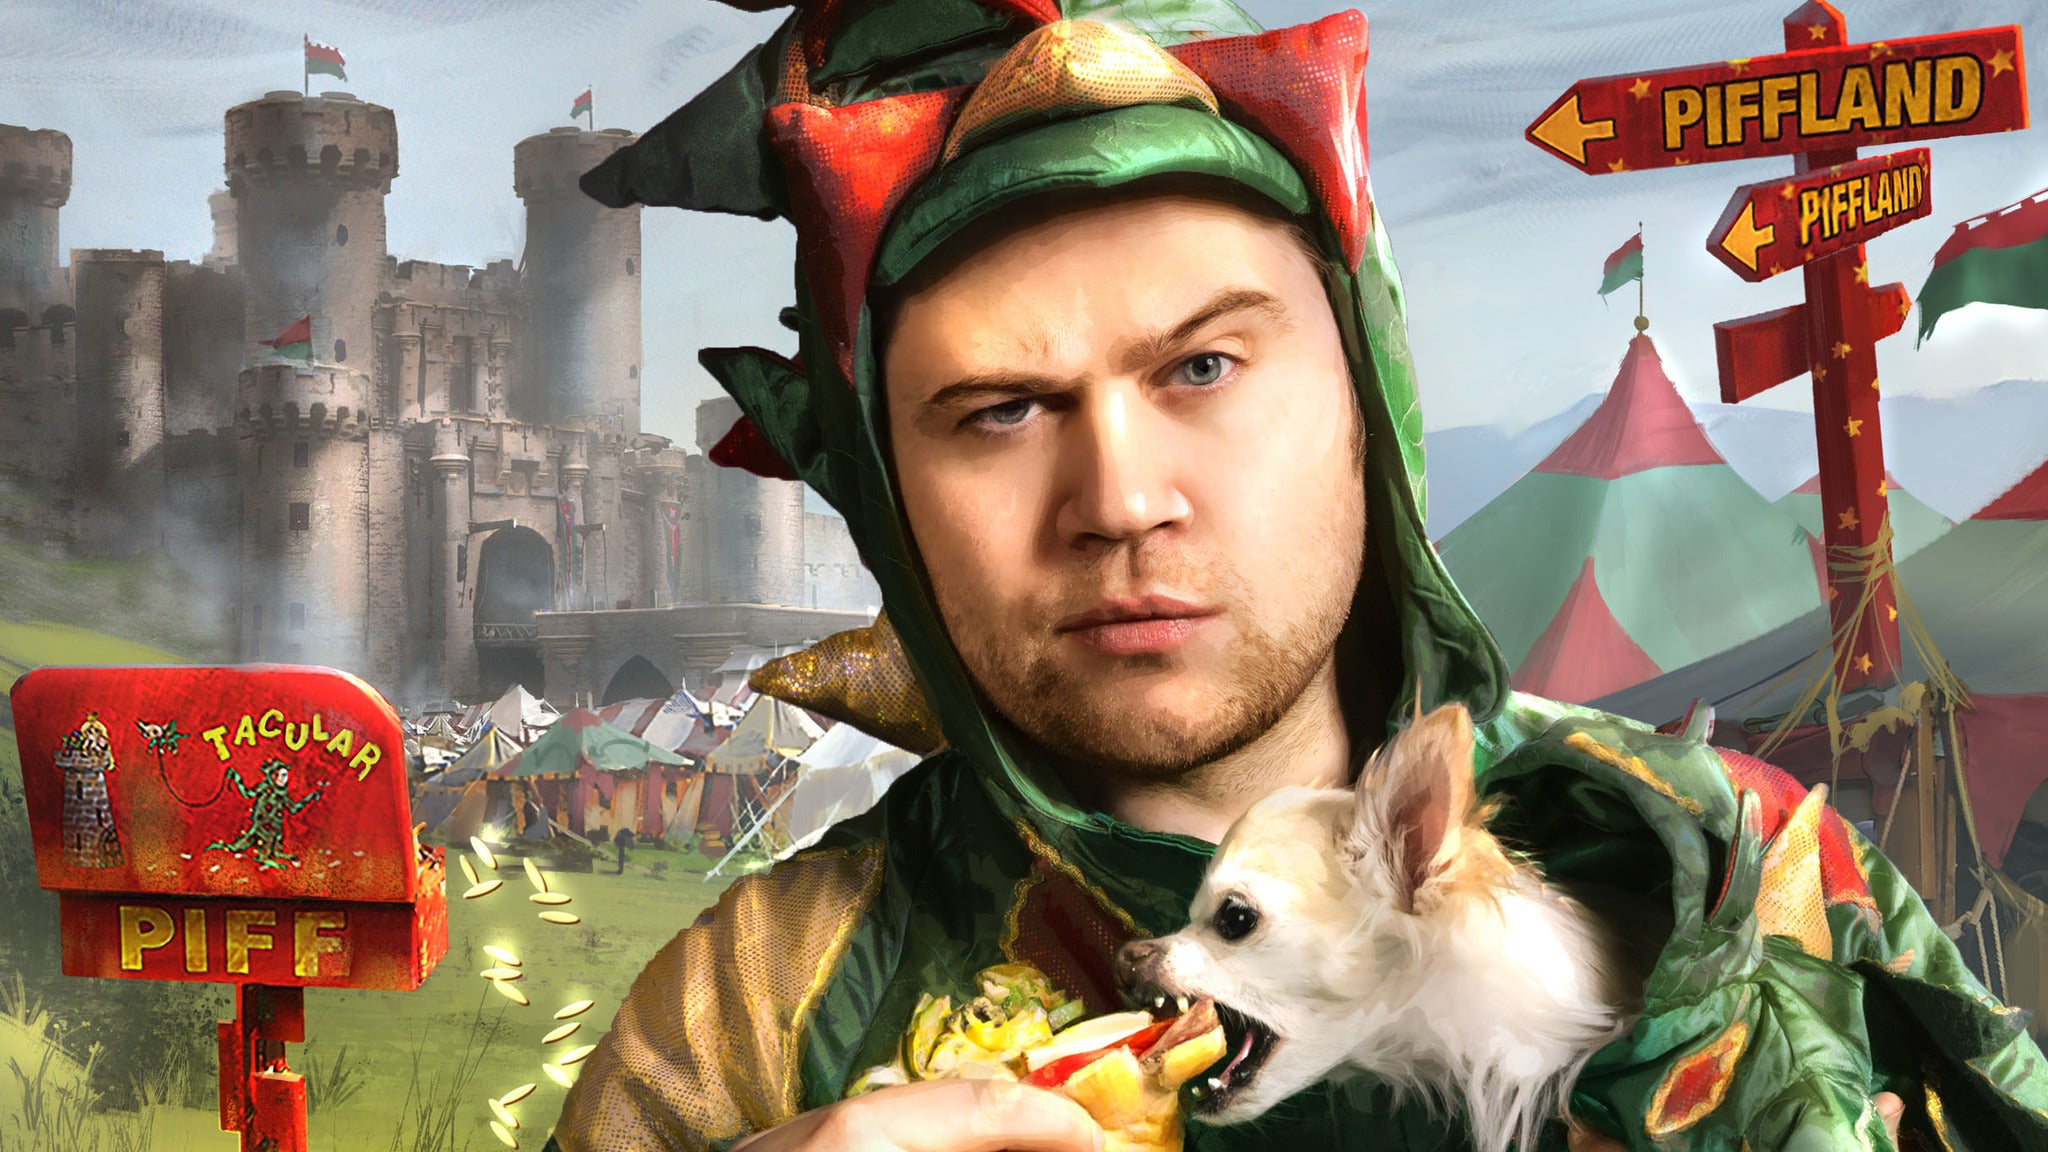 Piff the Magic Dragon at IP Casino Resort and Spa